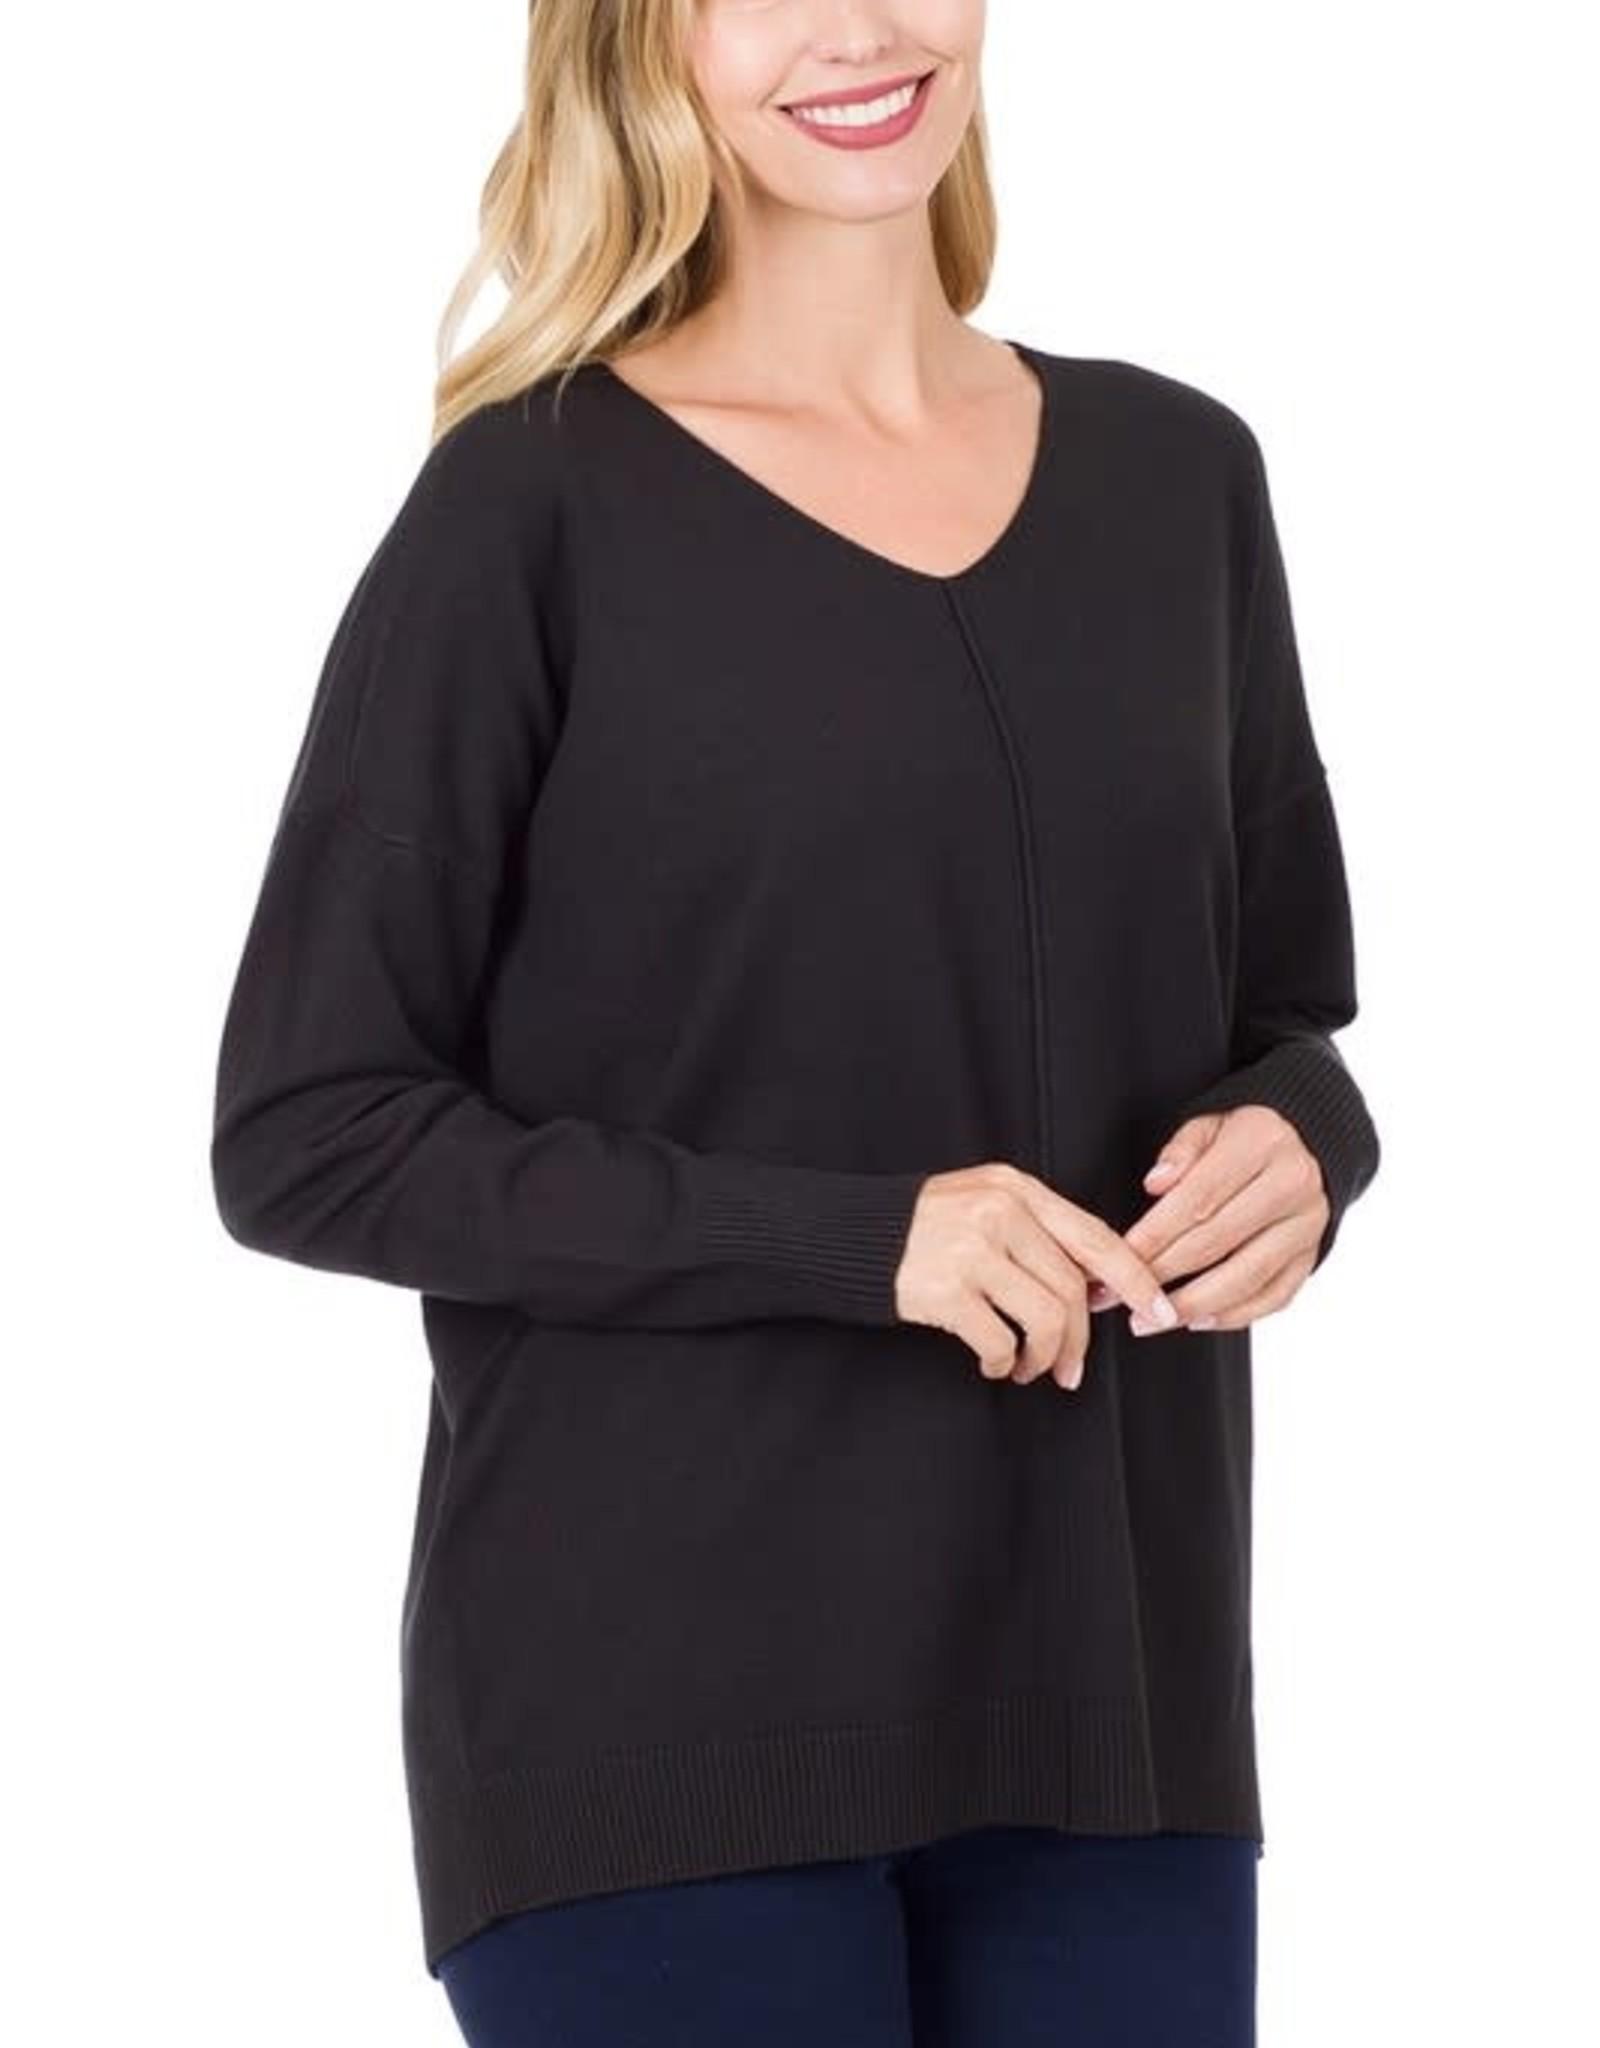 - Black V-Neck Sweater w/ Center Seam